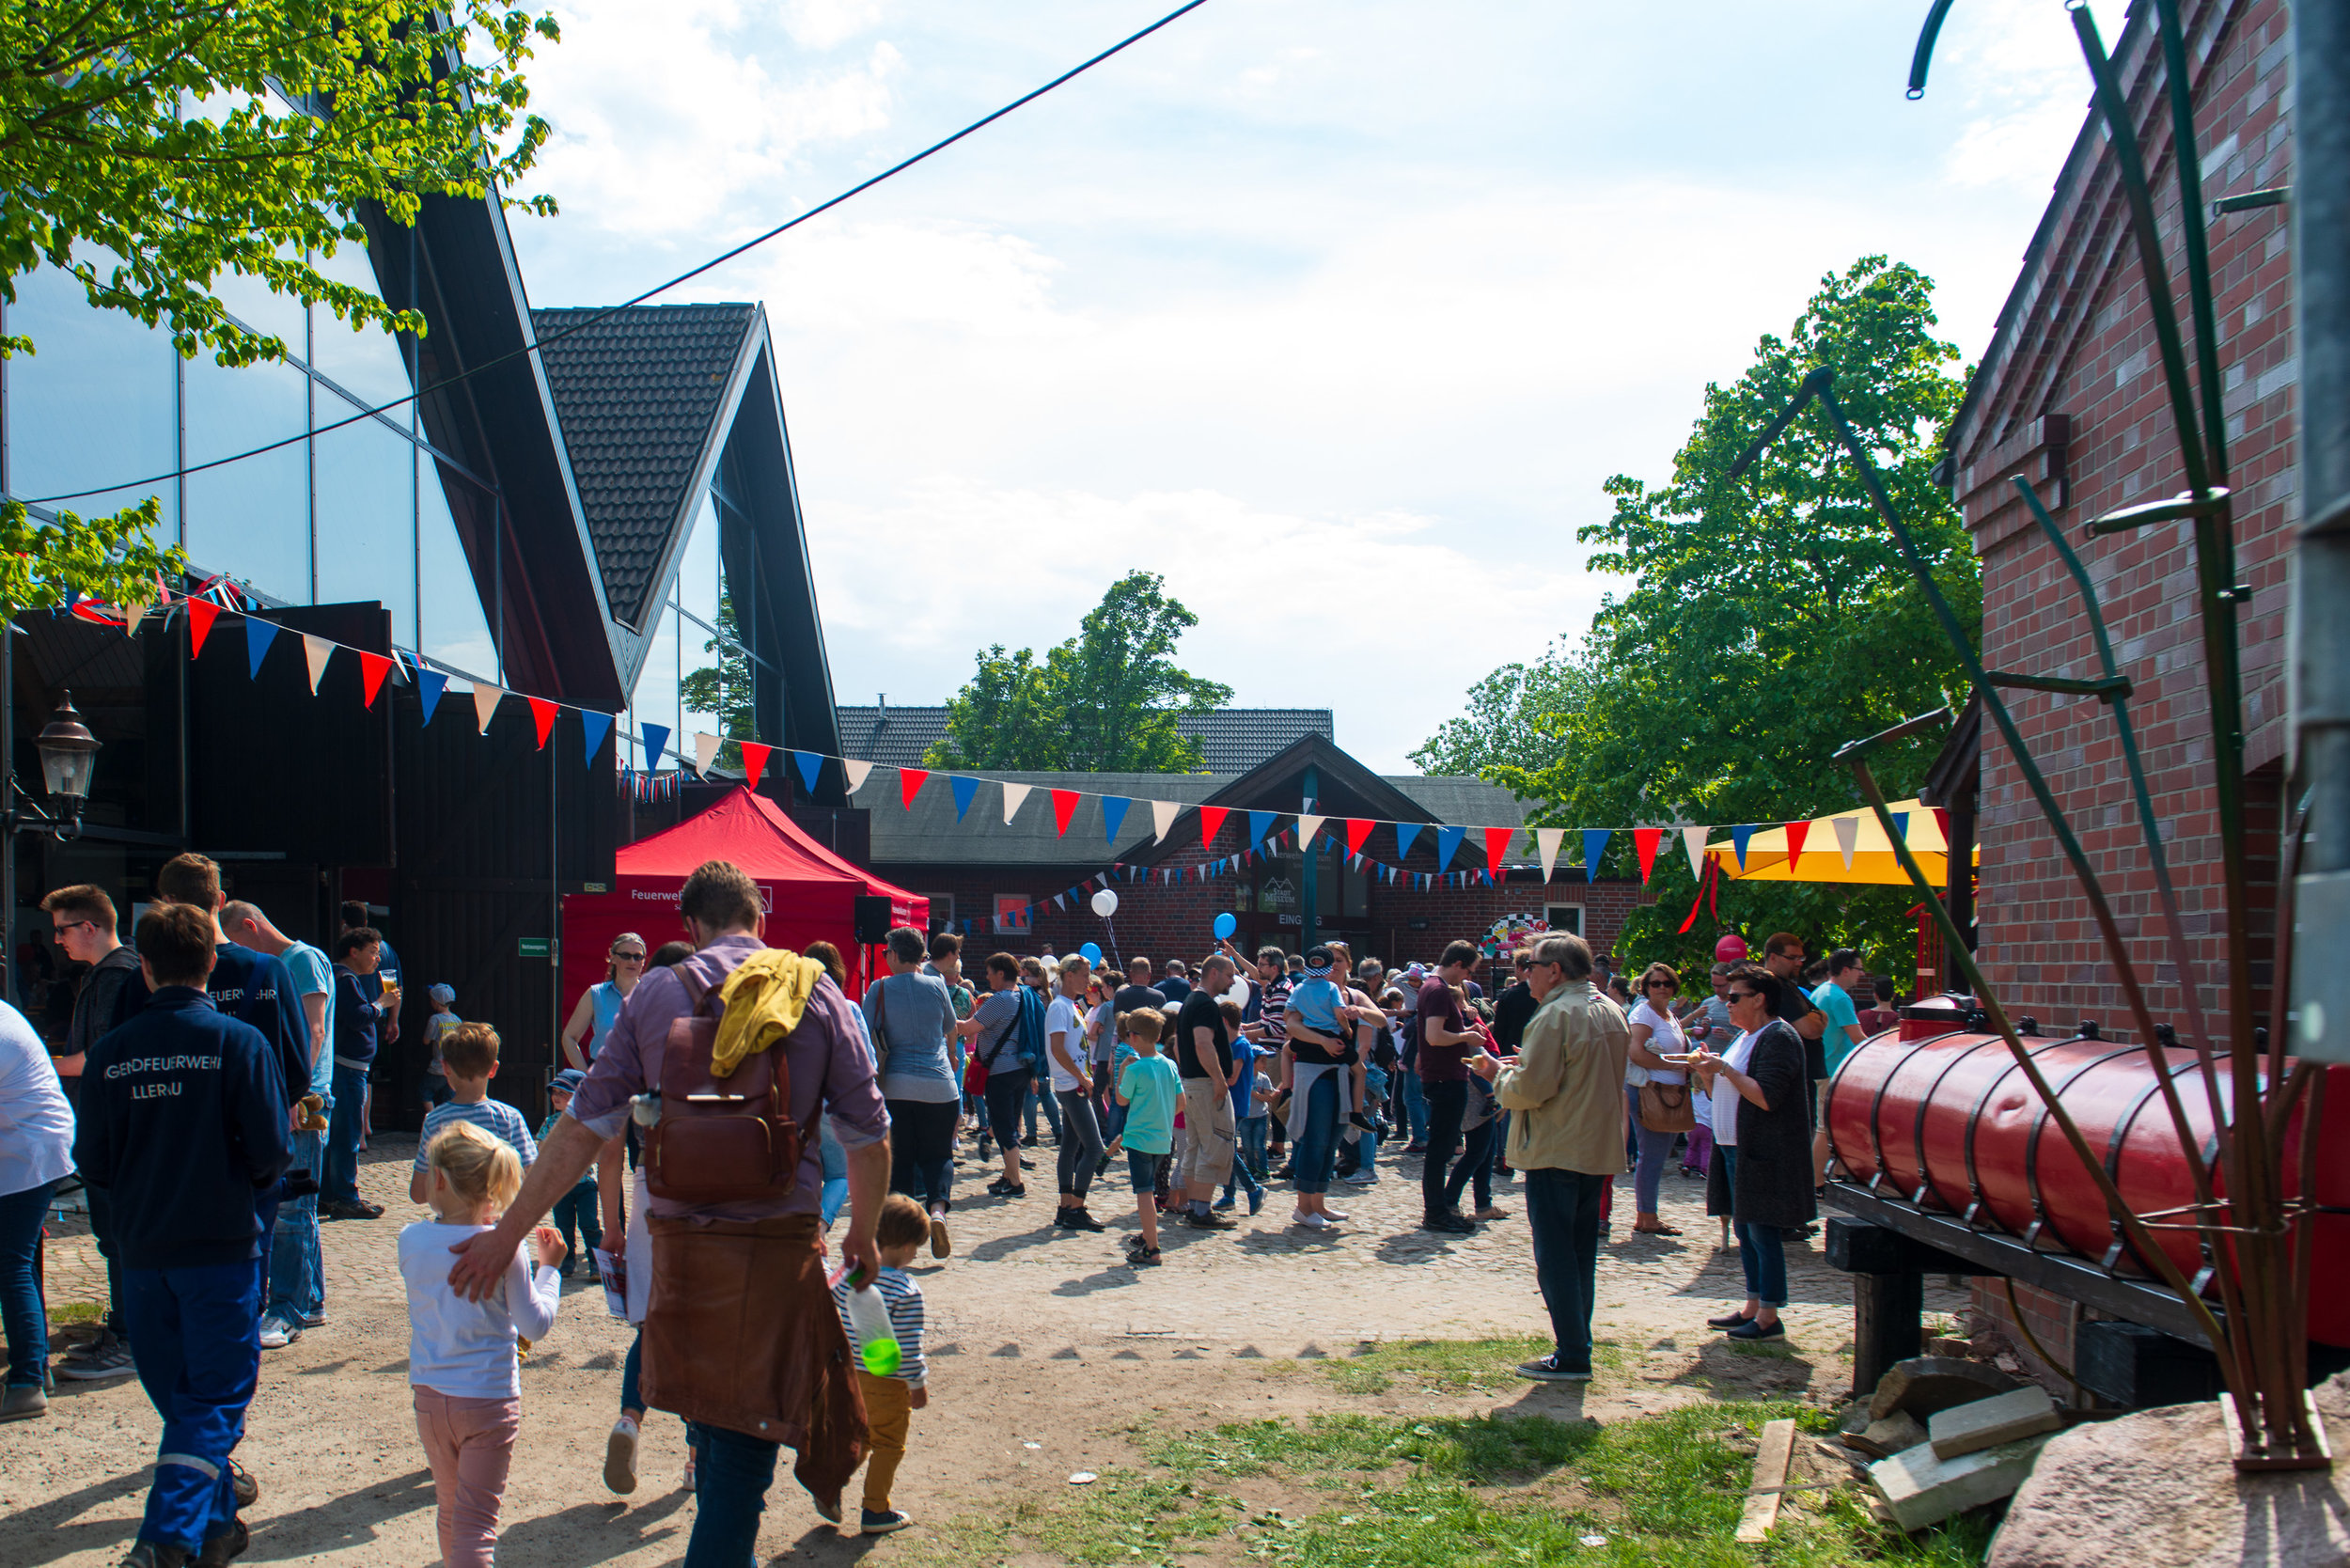 13-Norderstedter-Museumsfest-2019-FWM--XO-Dennys-Mamero-WEB-59.jpg